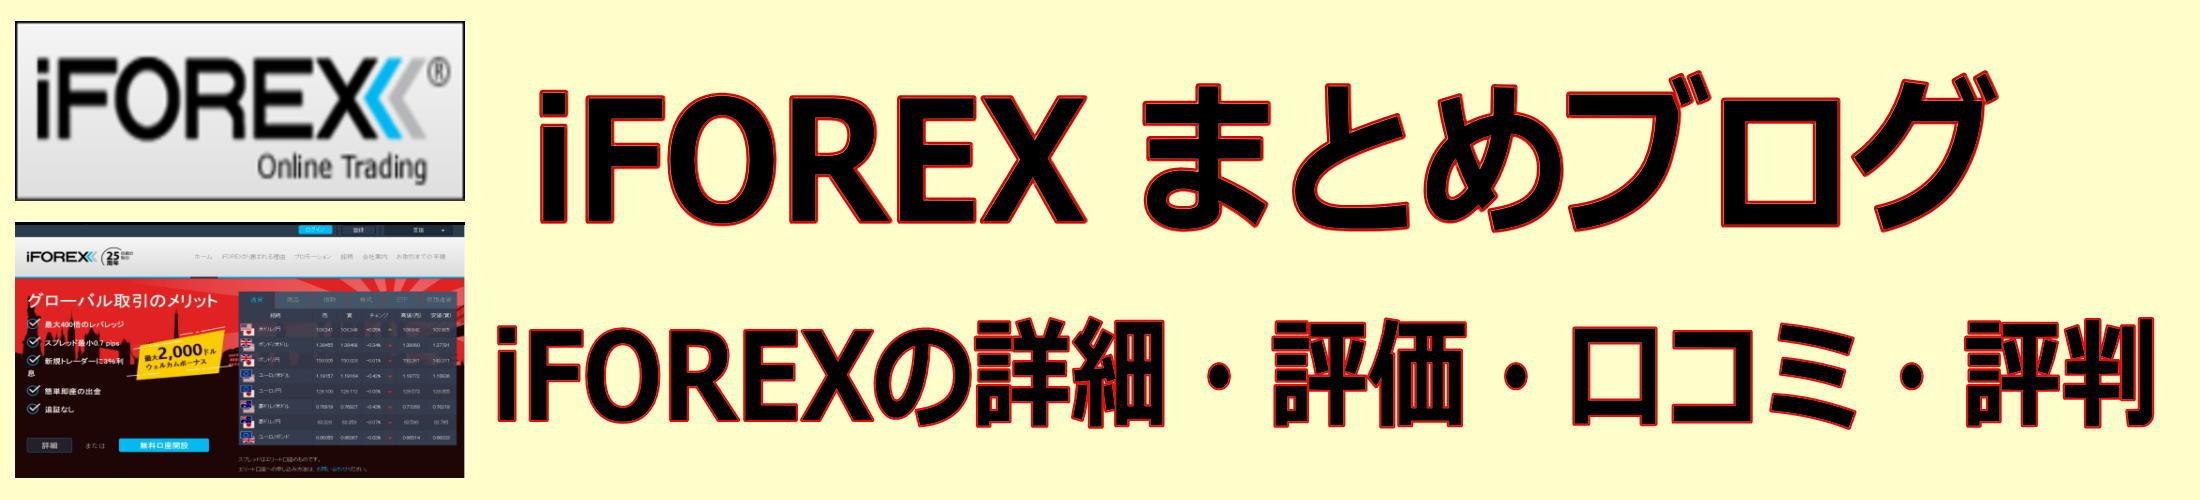 iFOREXの口コミ・評判・詳細・概要・レビュー・比較